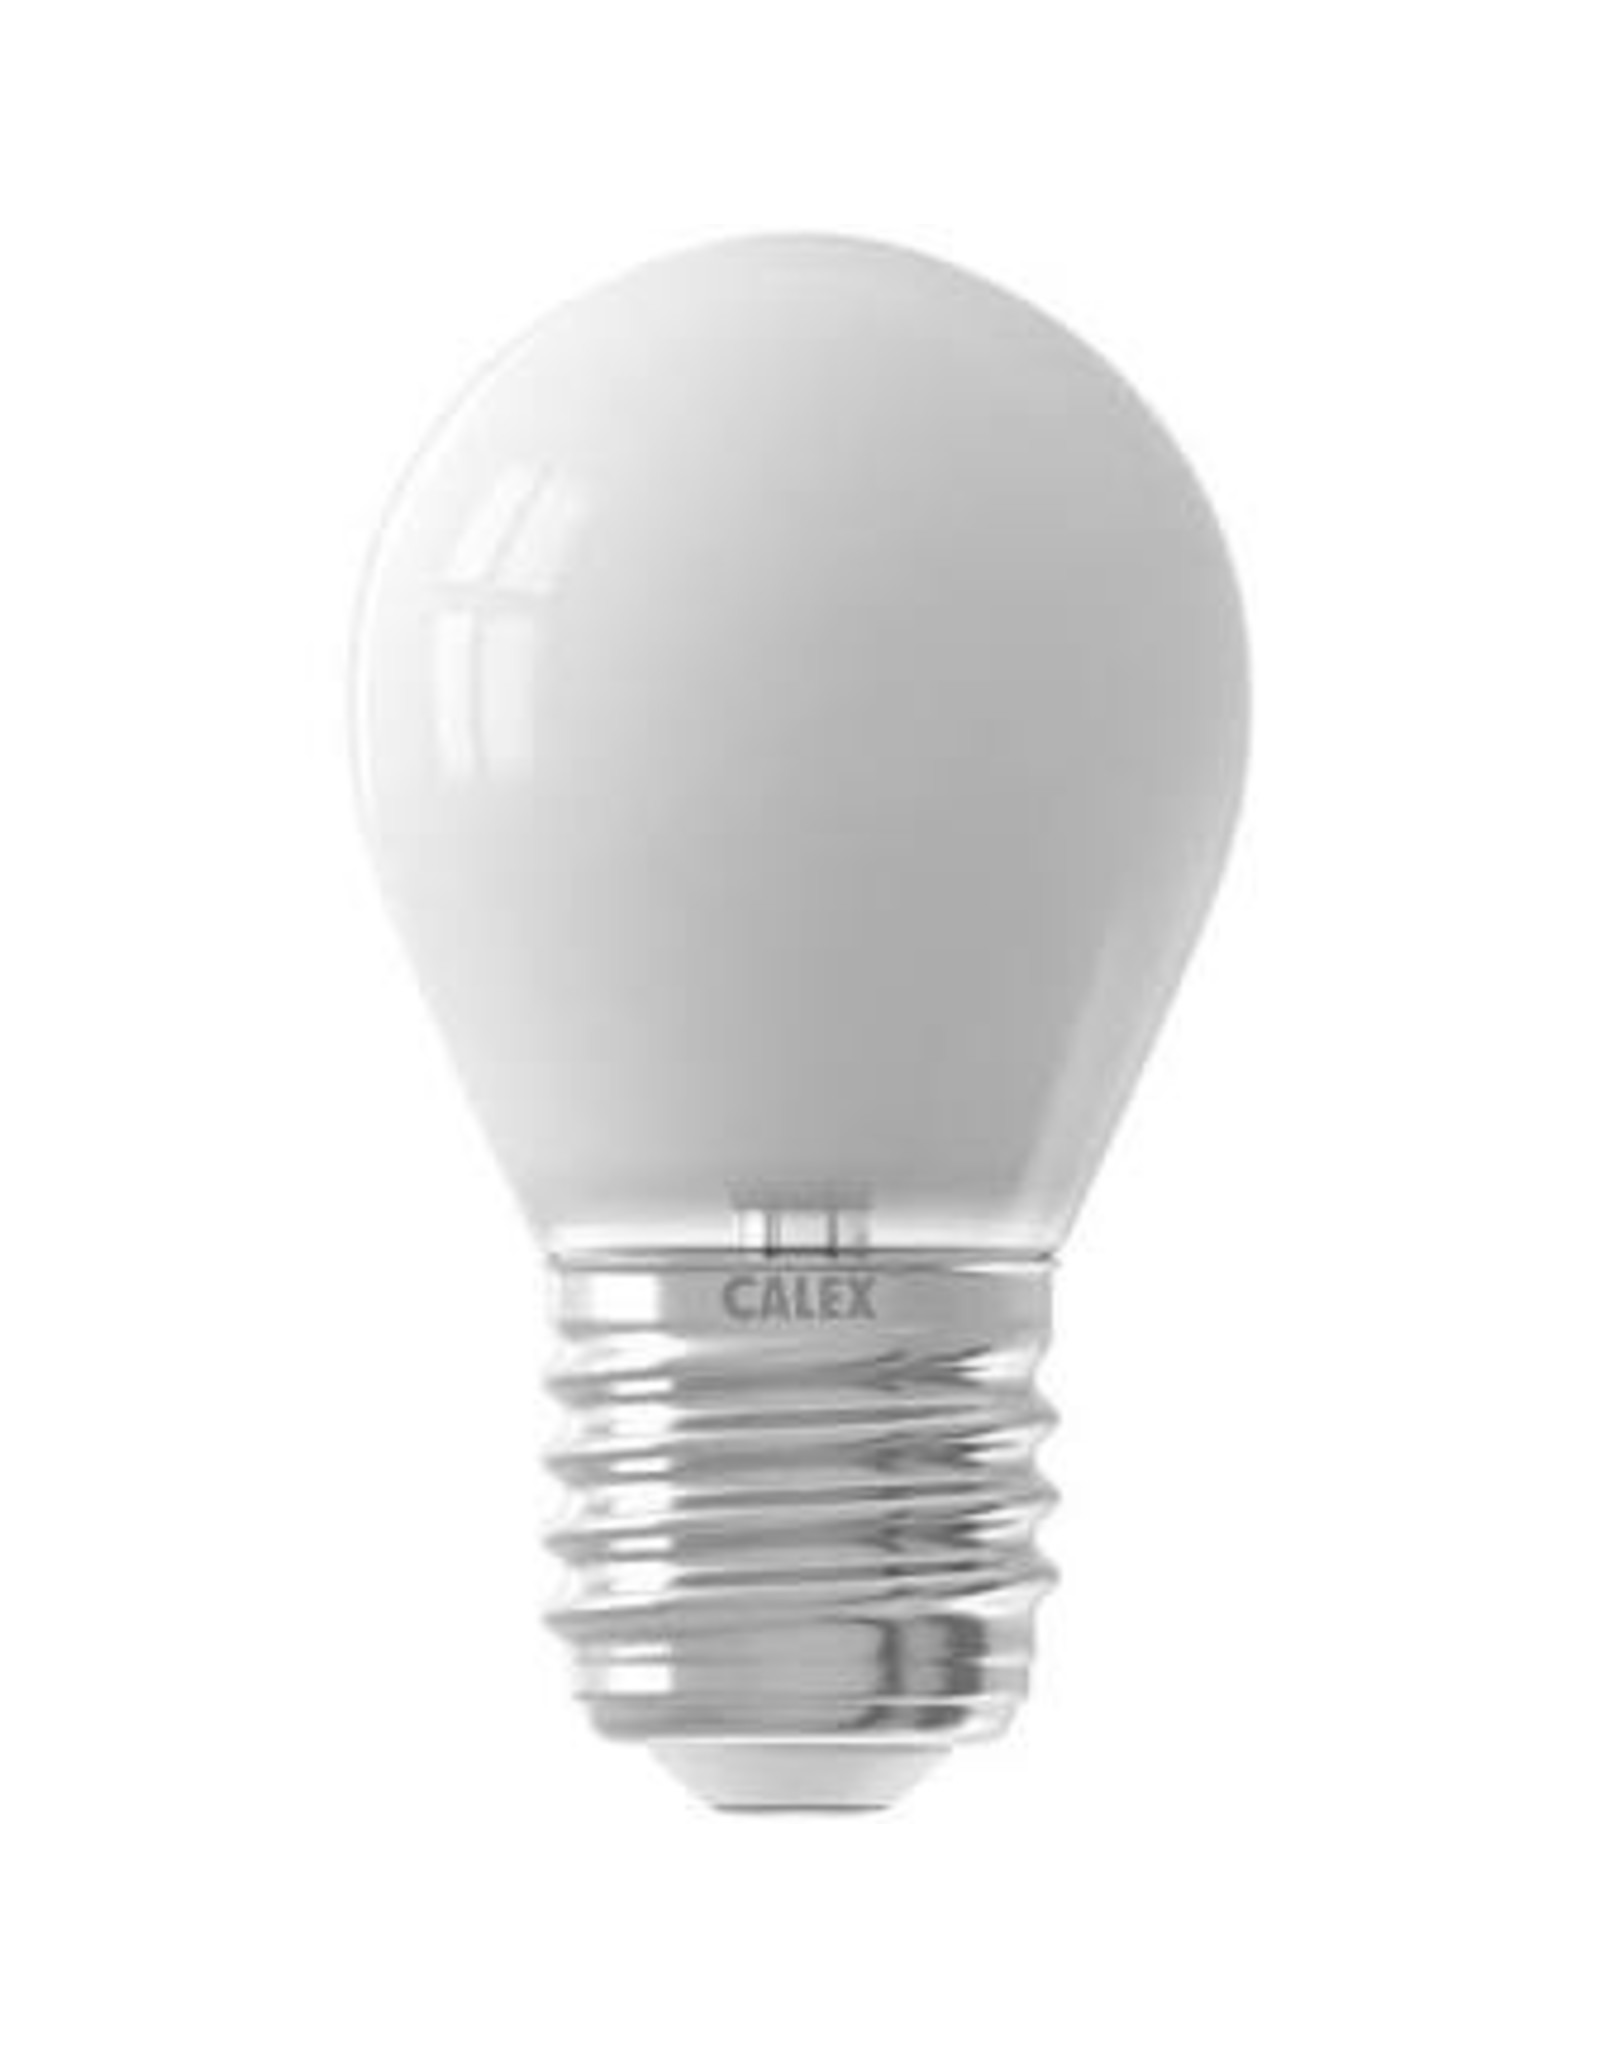 Calex LED Full Glass Filament Ball-lamp 220-240V 3,5W 350lm E27 P45, Softline 2700K CRI80 Dimmable, energy label A++